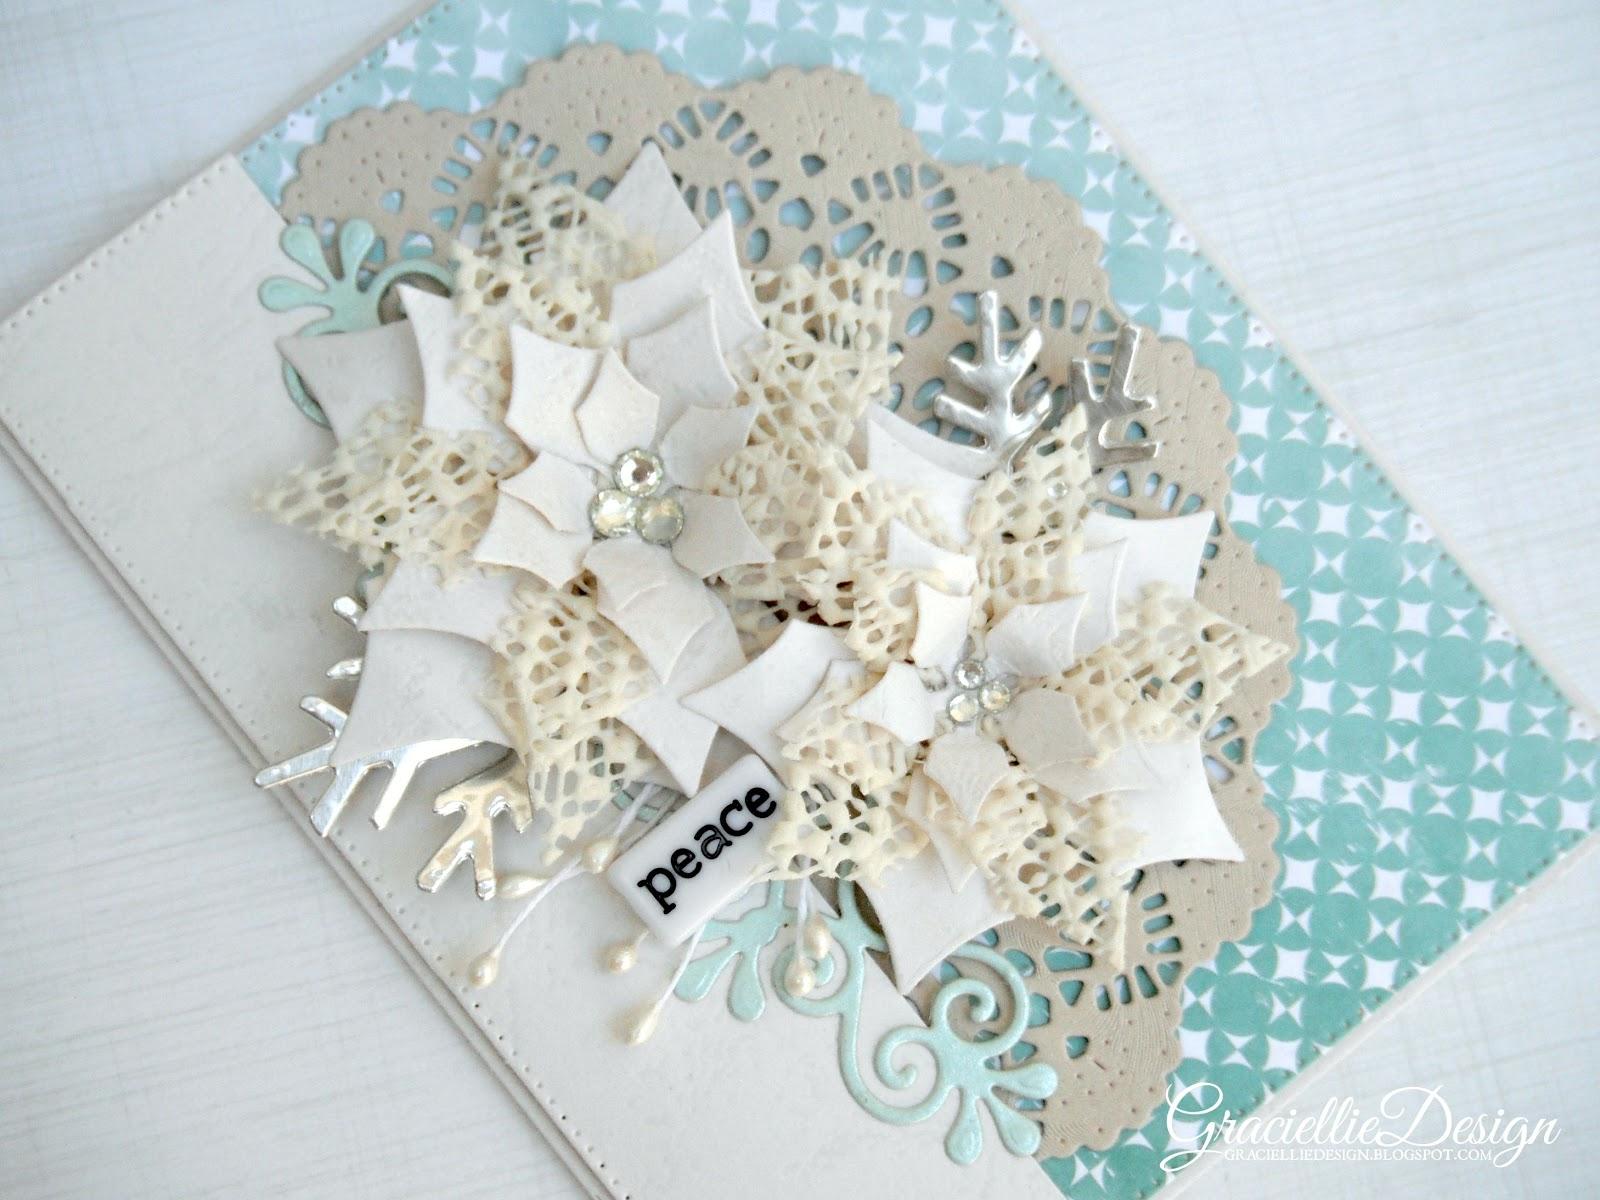 Textured Poinsettias Monochromatic Christmas Card